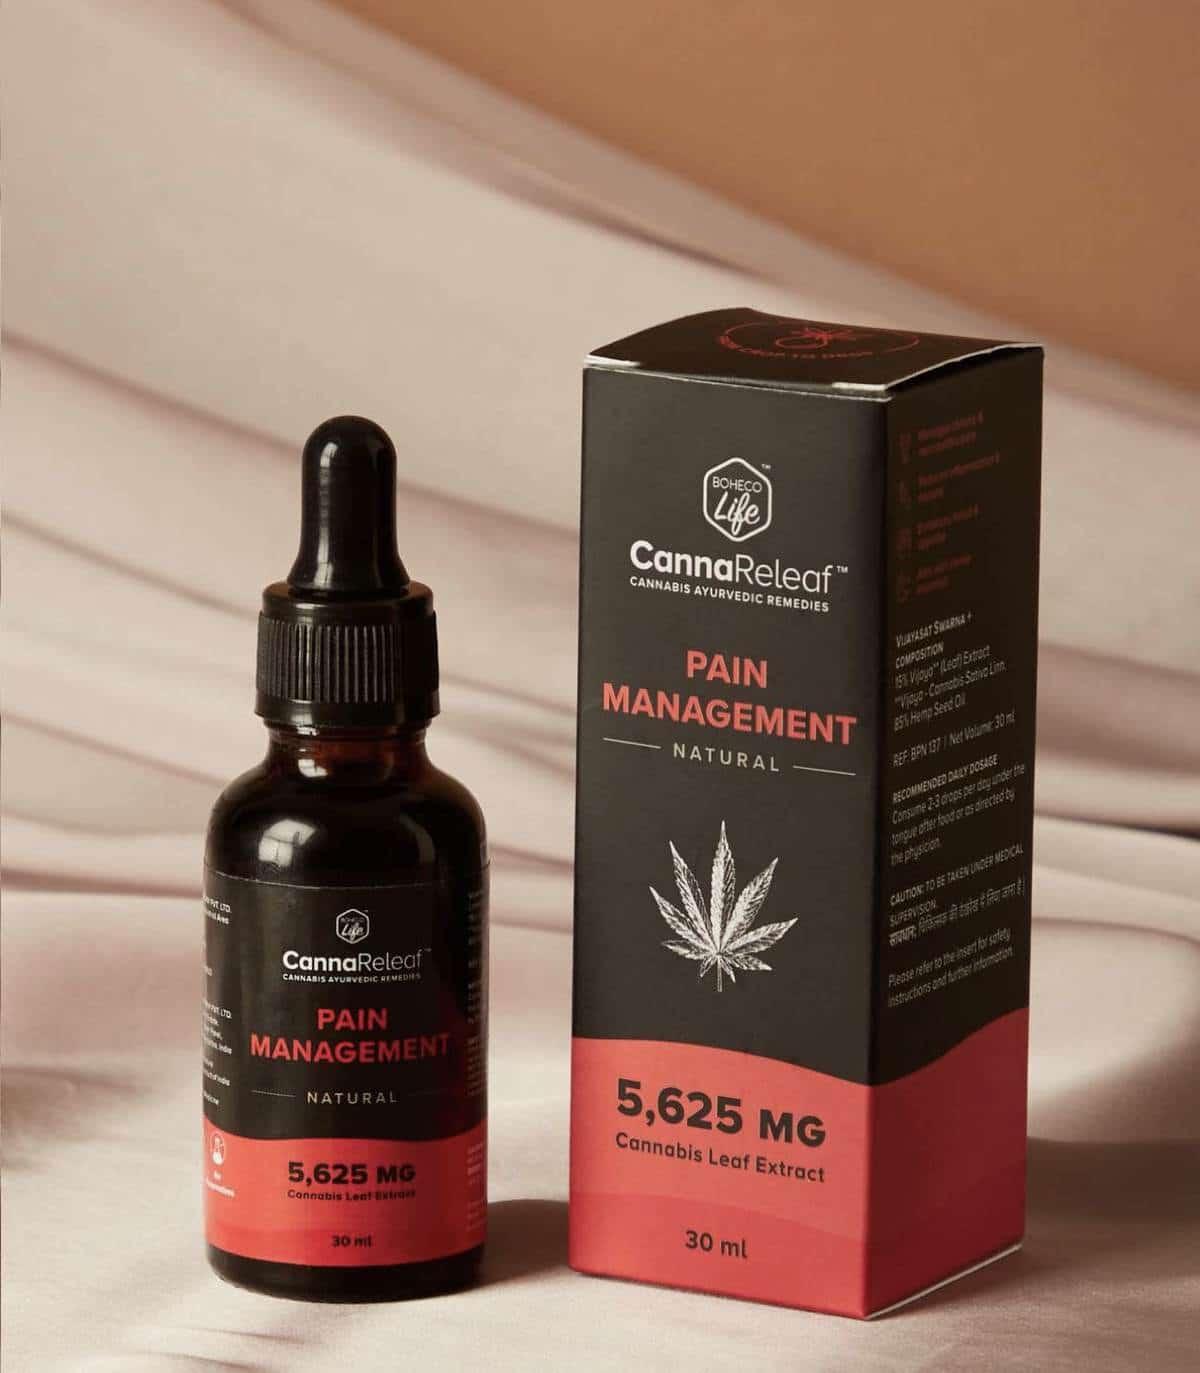 CannaReleaf Pain Management Cannabis Leaf Extract 5625mg – 30ml